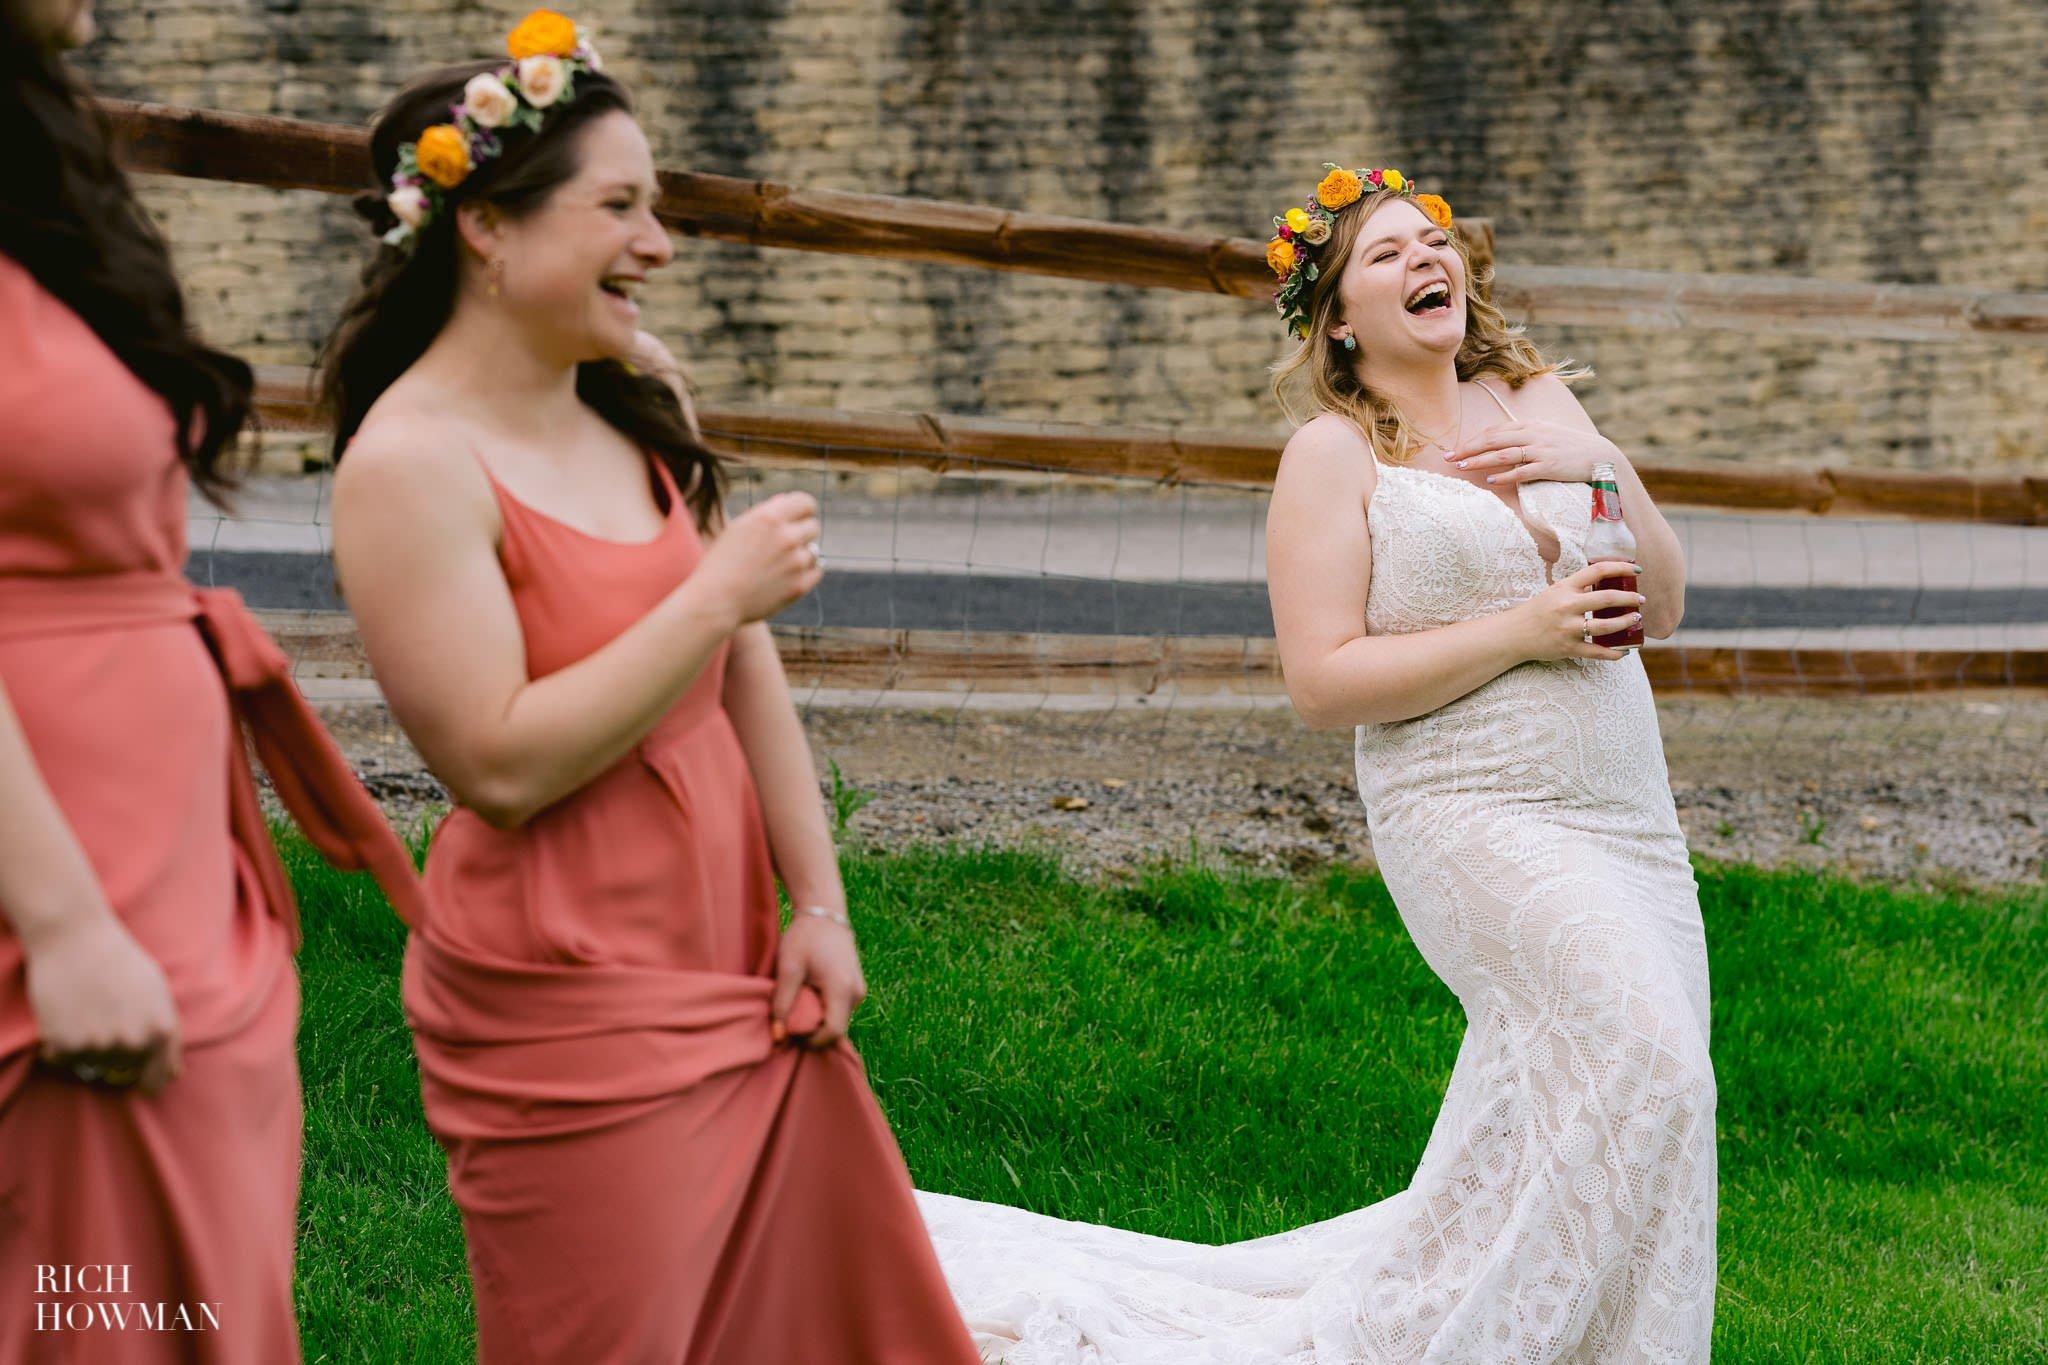 Gloucestershire Wedding Photographer - Joey and Jenessa 60